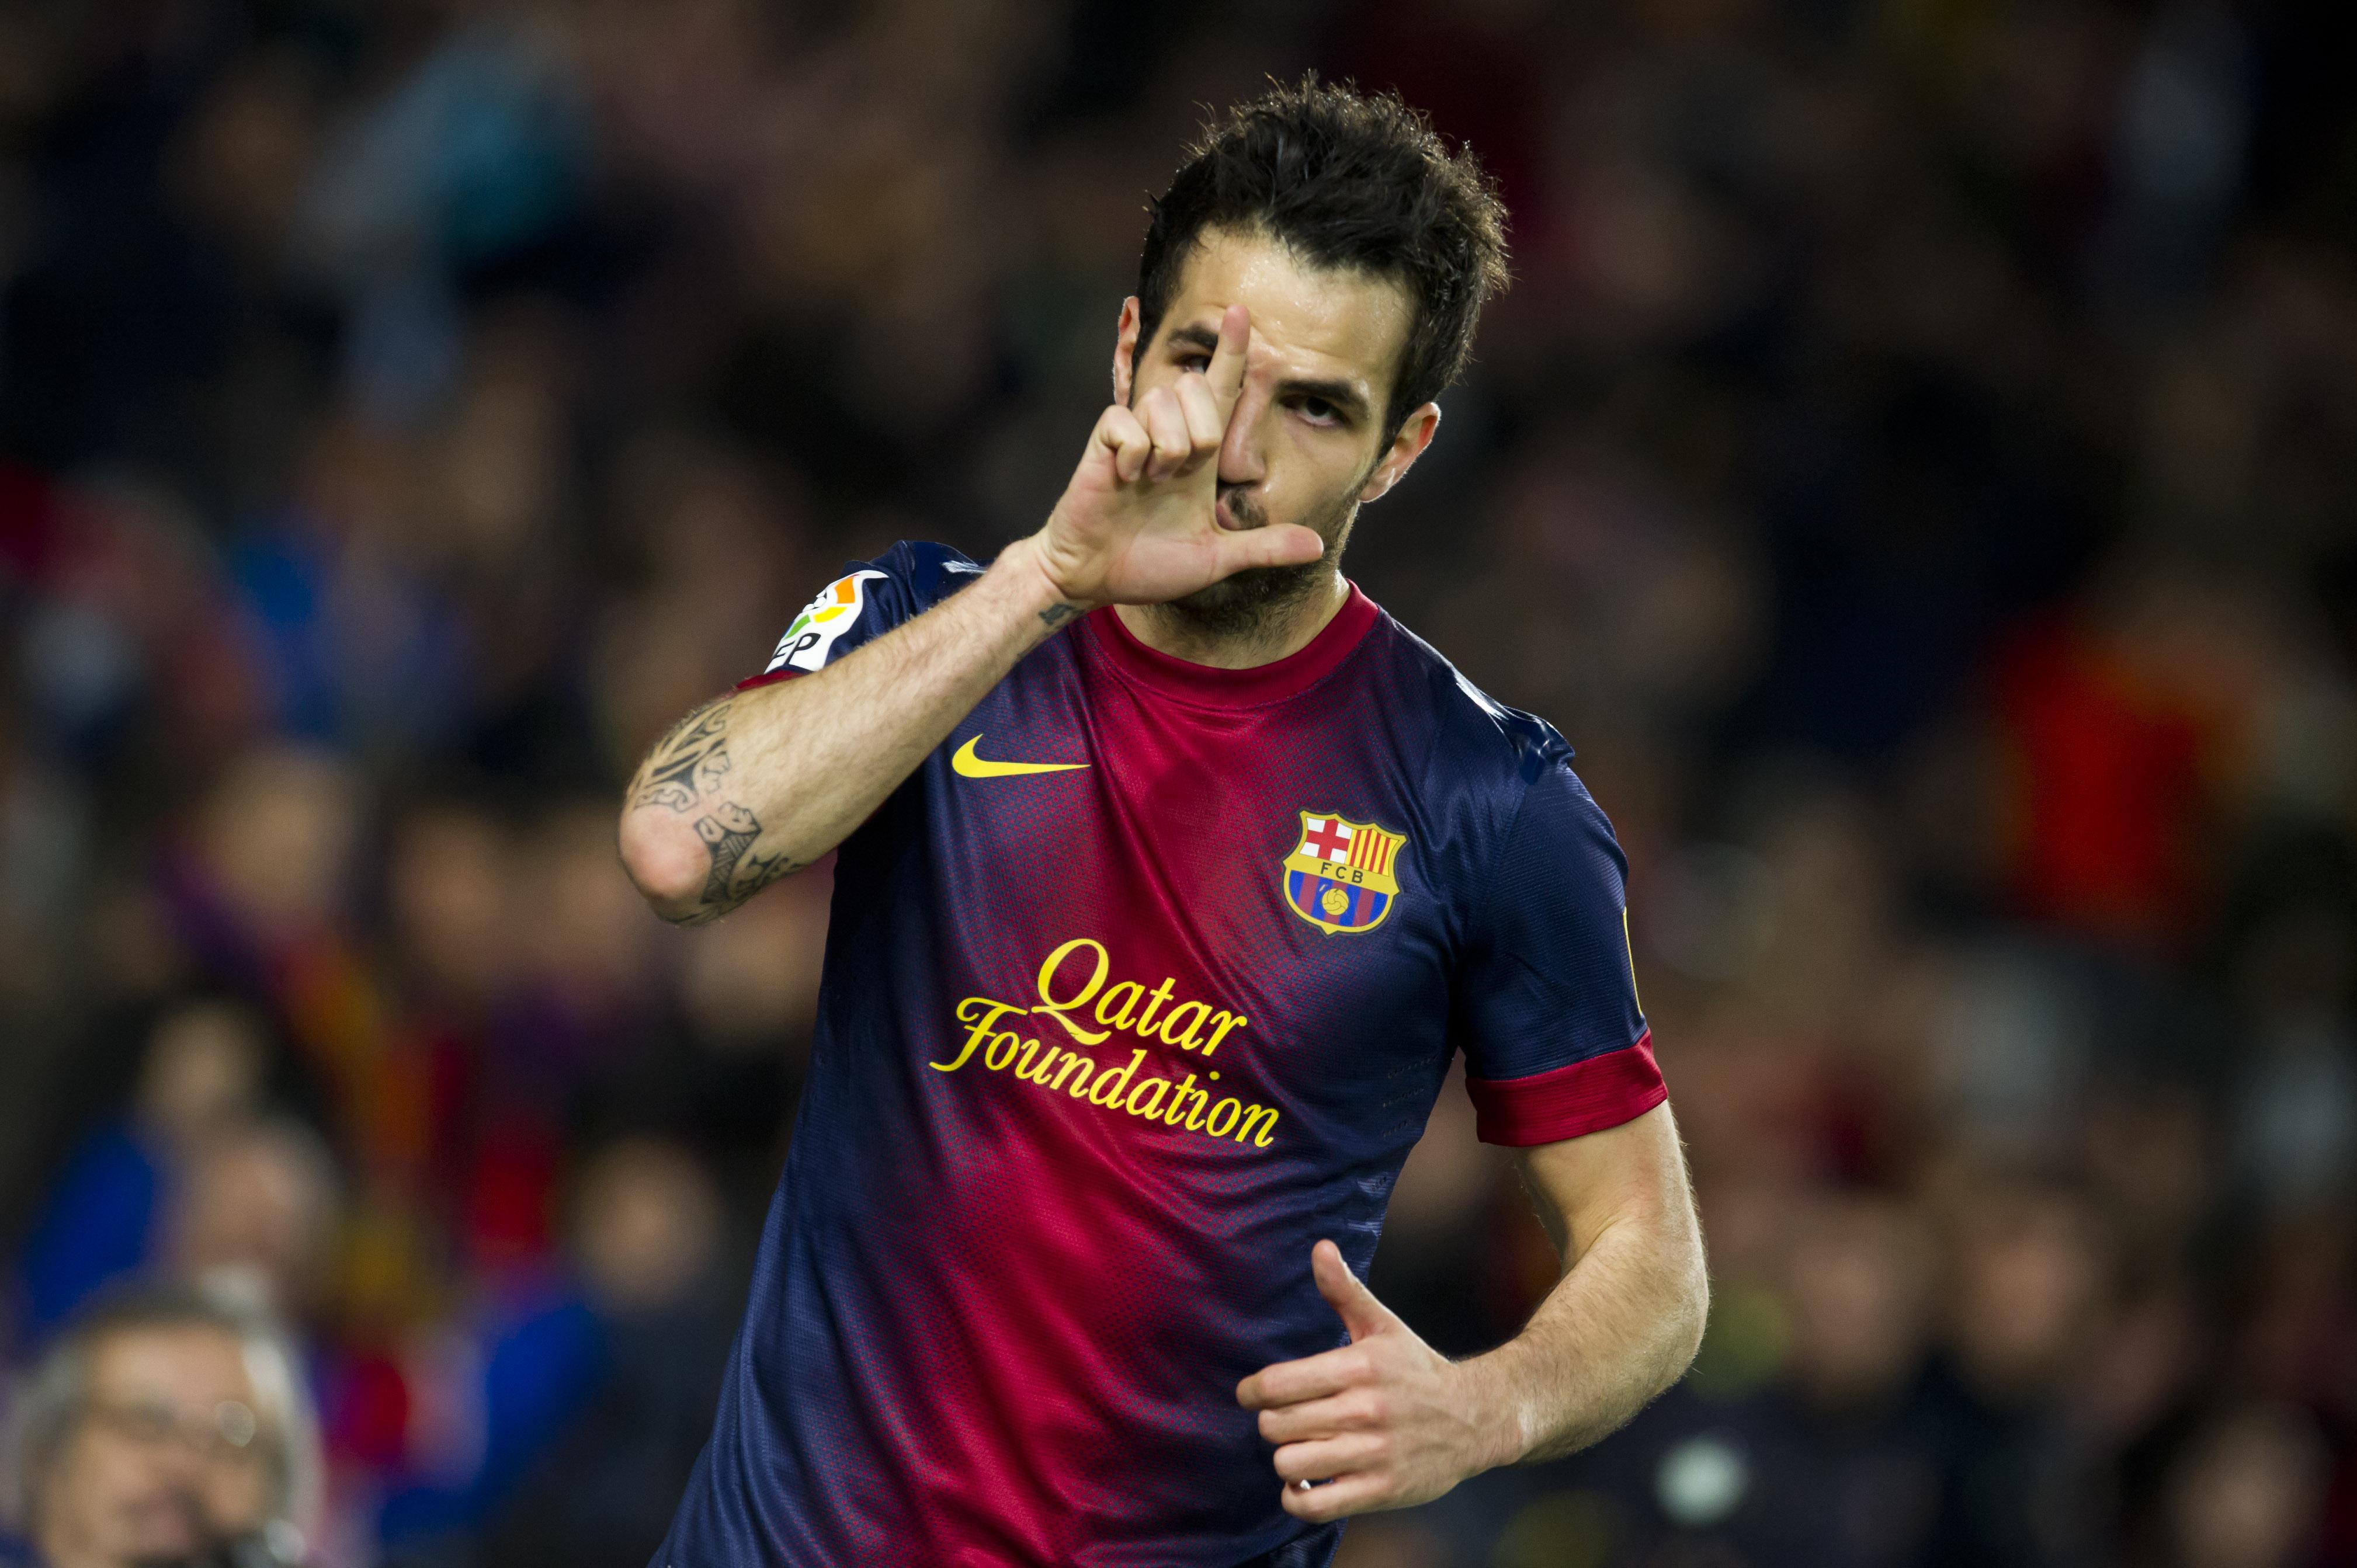 Cesc celebra uno de sus goles / Marcamedia